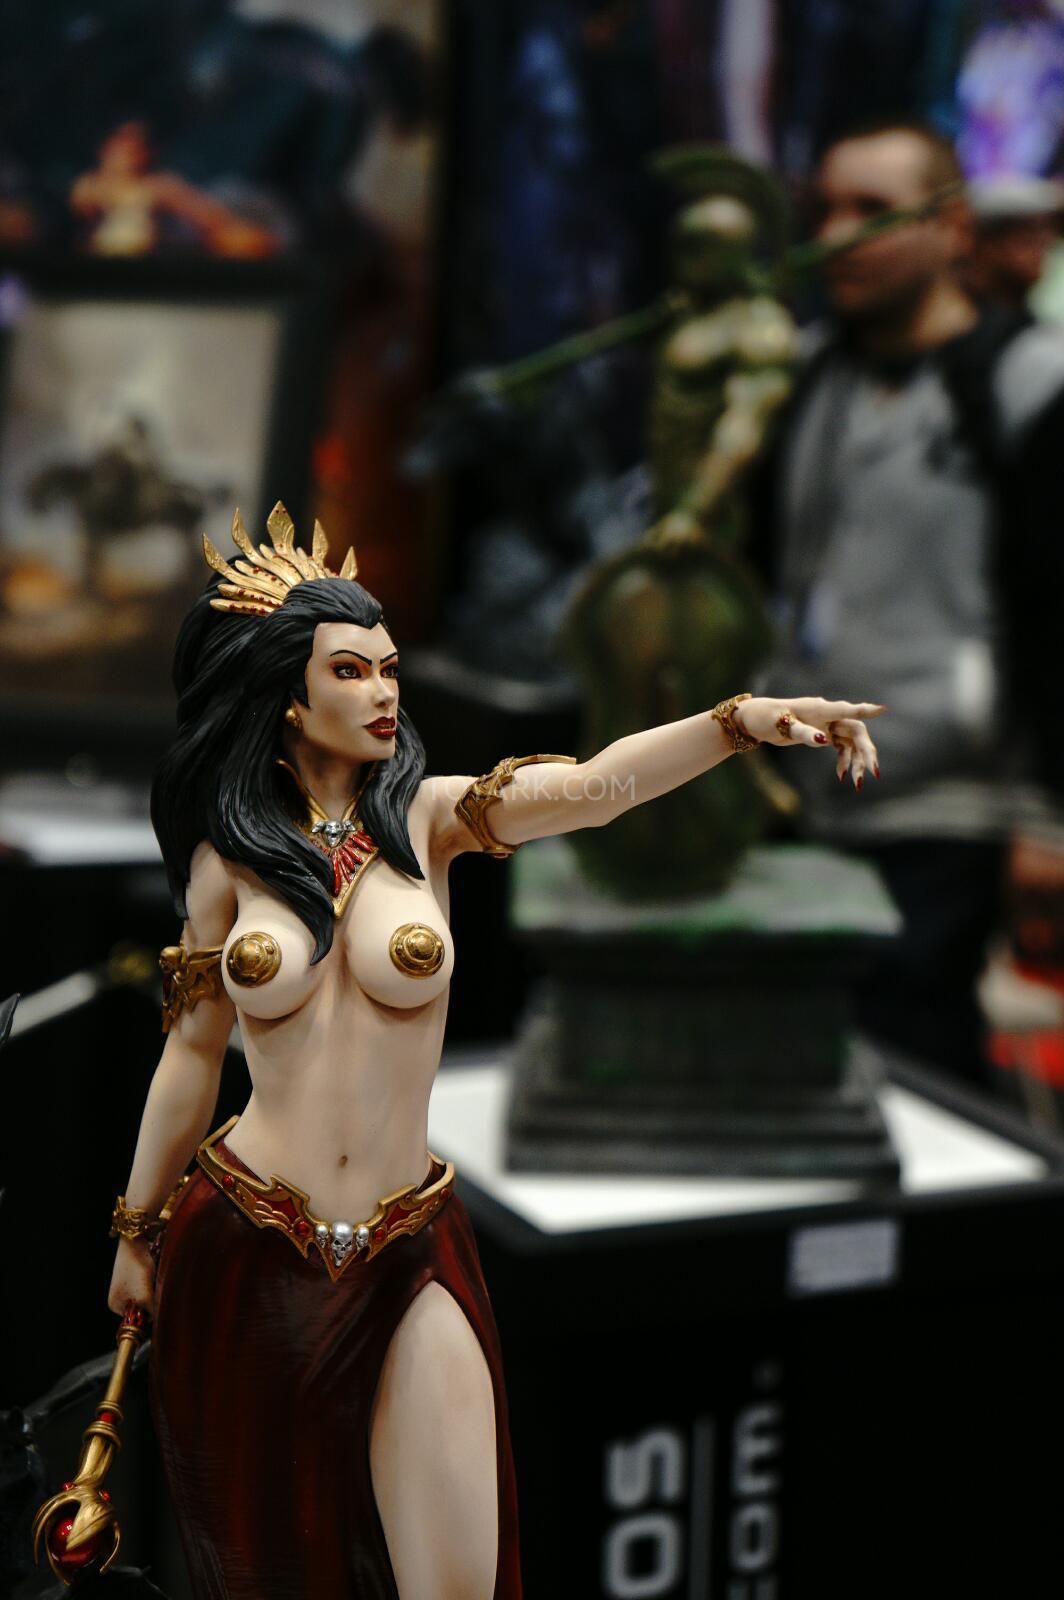 [ARH Studios] New Queen of Vampires 1/4 Scale Statue - Página 2 NYCC-2014-ARH-Studios-013